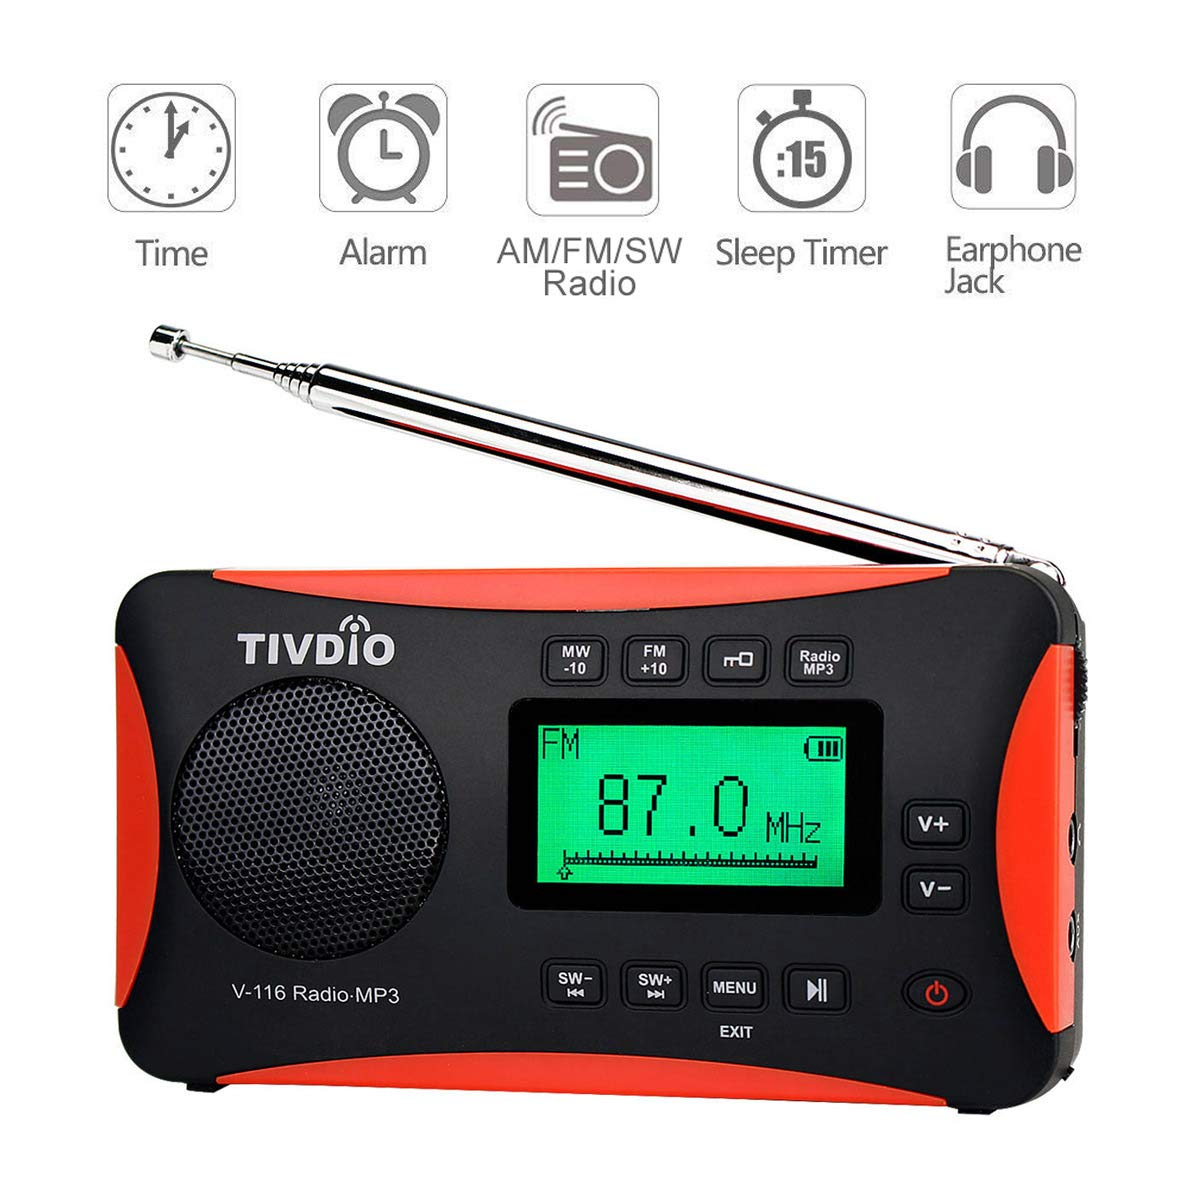 Tivdio Radio Portátil FM MW SW Receptor Mundial Reproductor de MP3 Despertador con Temporizador con Batería Recargable: Amazon.es: Electrónica